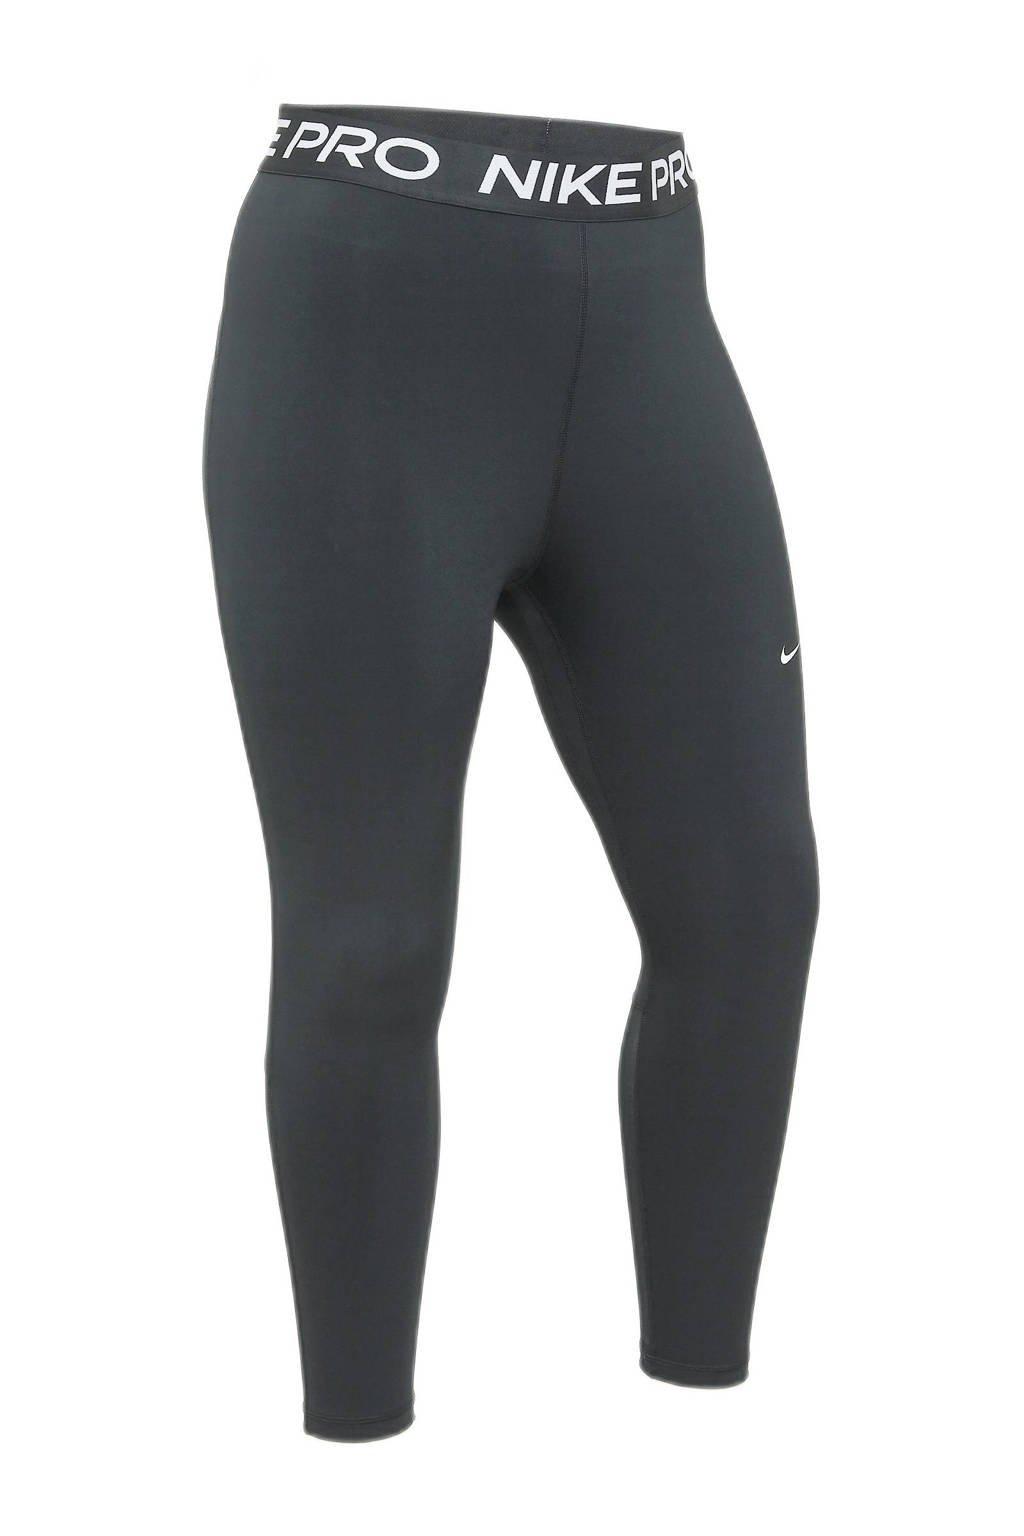 Nike Plus Size sportlegging zwart, Zwart